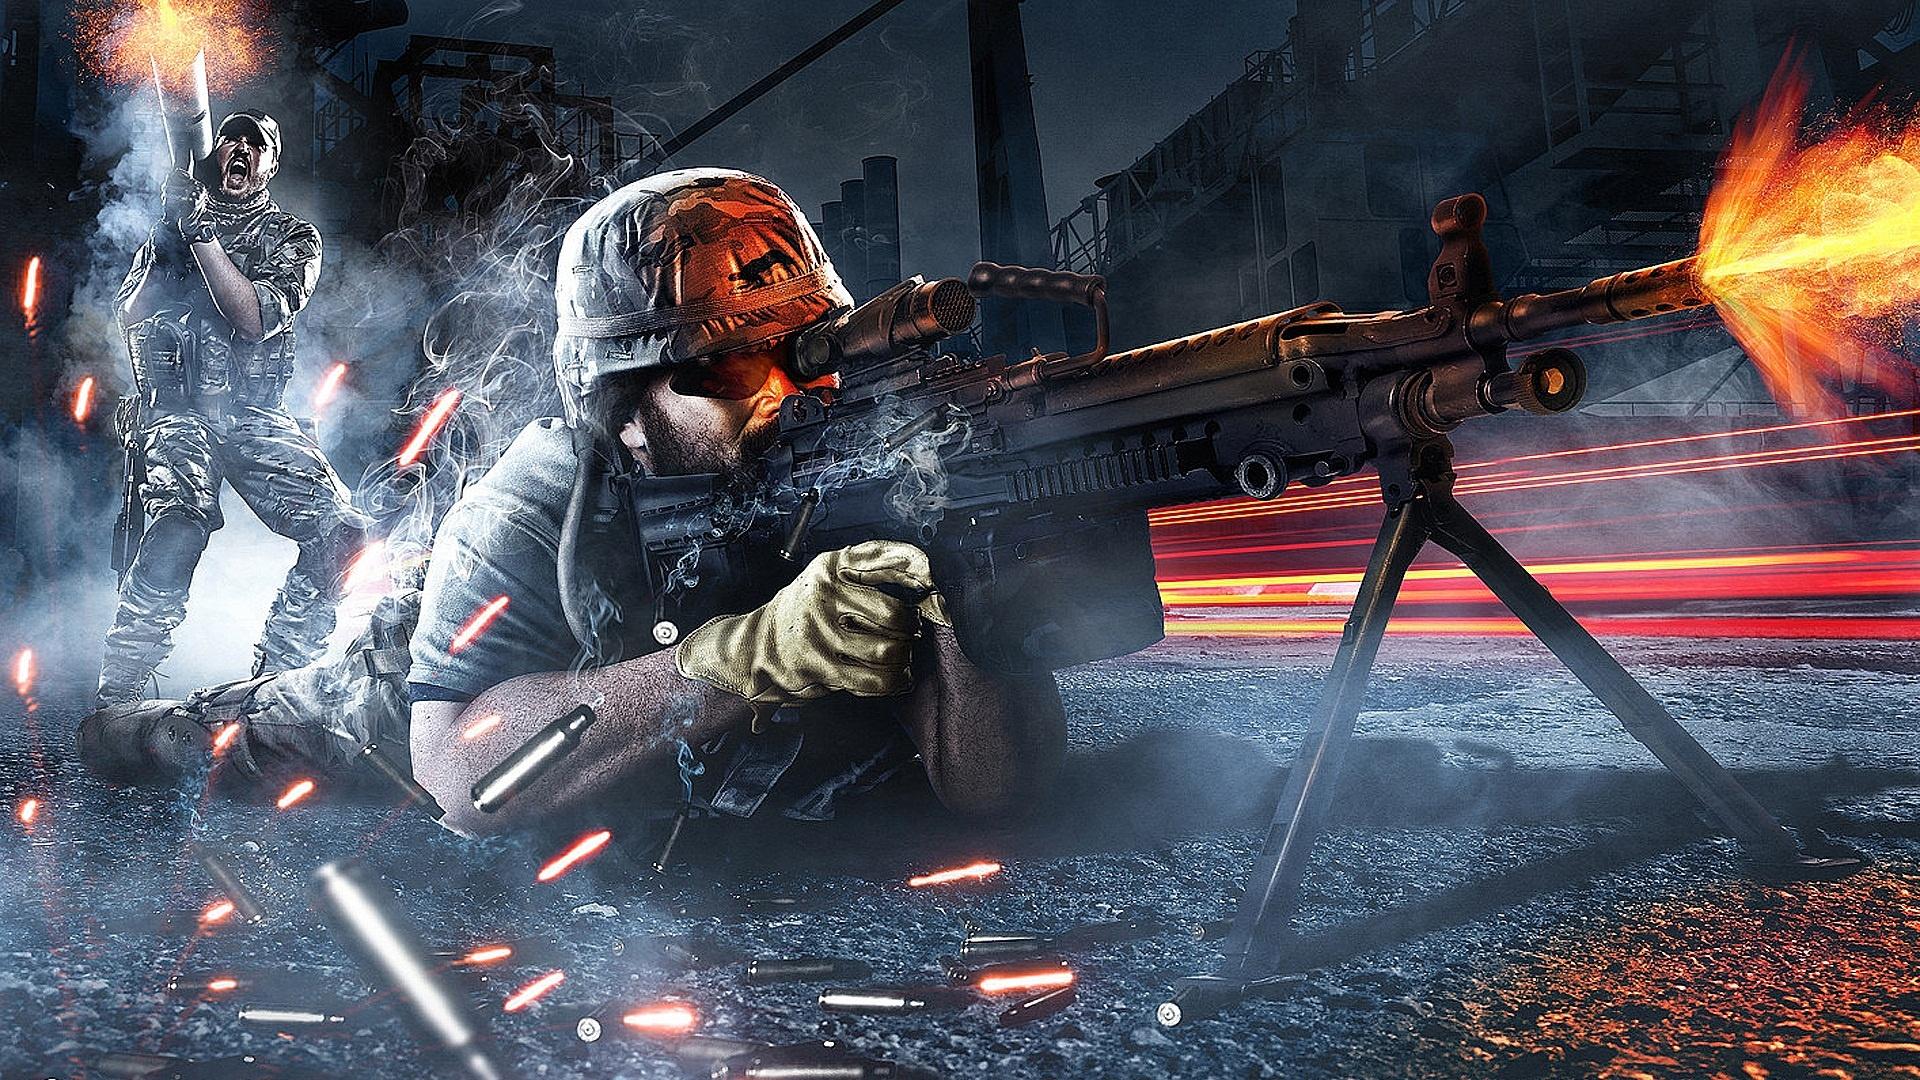 Battlefield 1 War Video Game Hd Wallpaper: Battlefield 3 Armored Kill Wallpapers